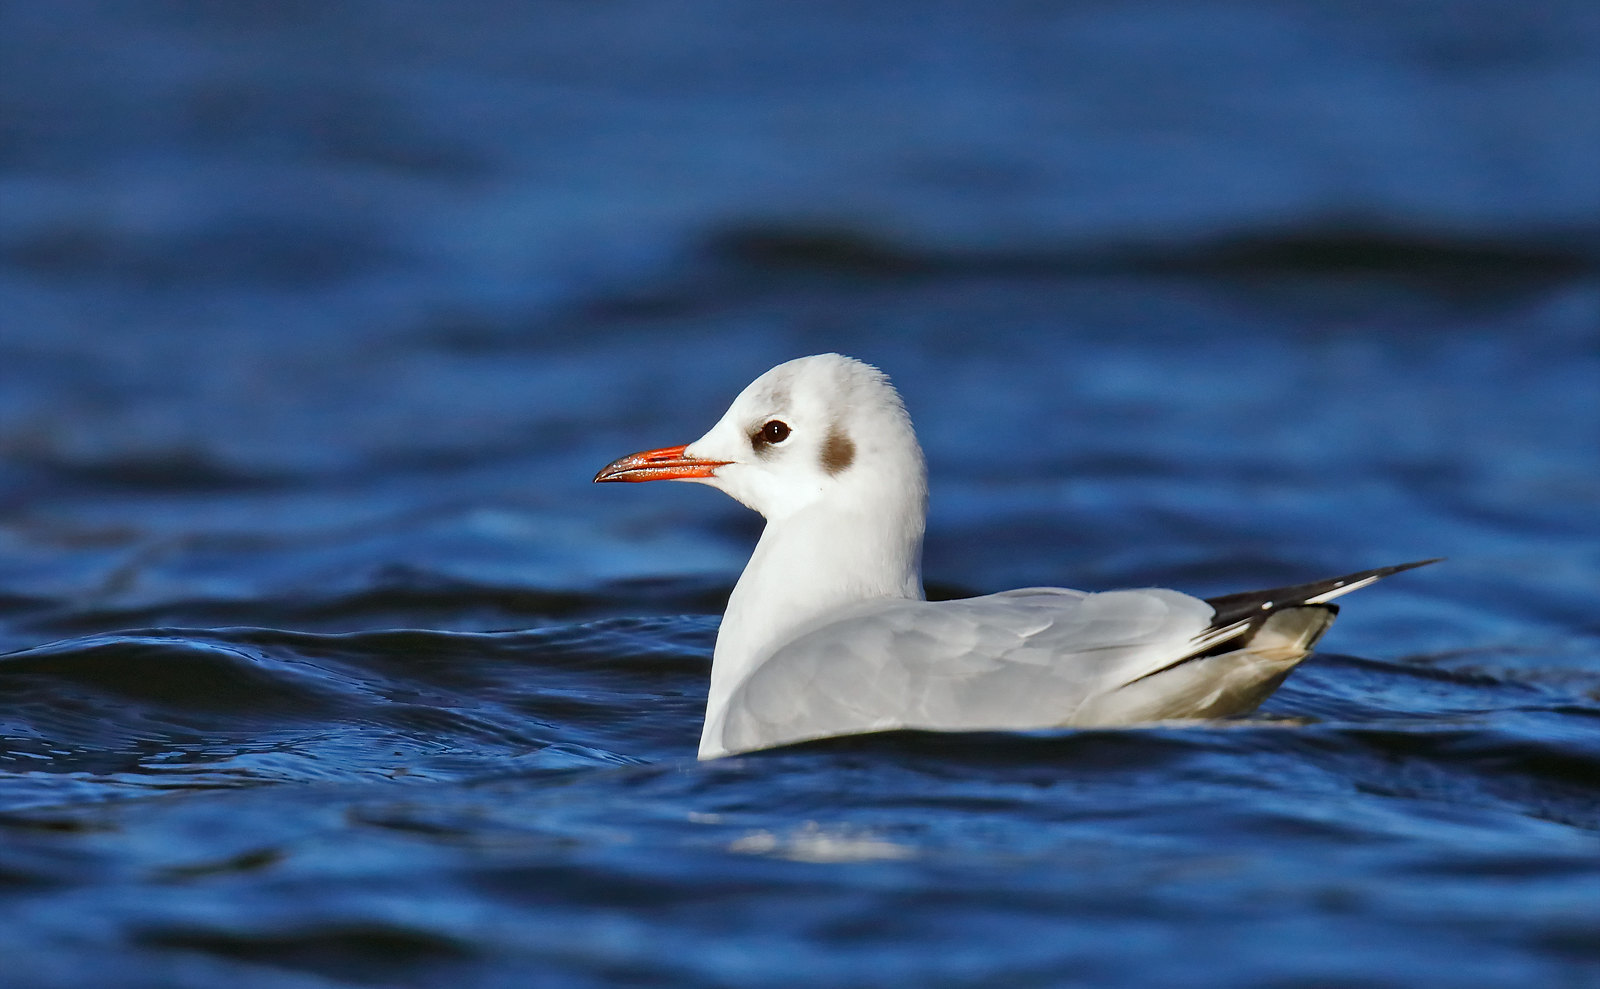 Black-headed Gull - adult winter